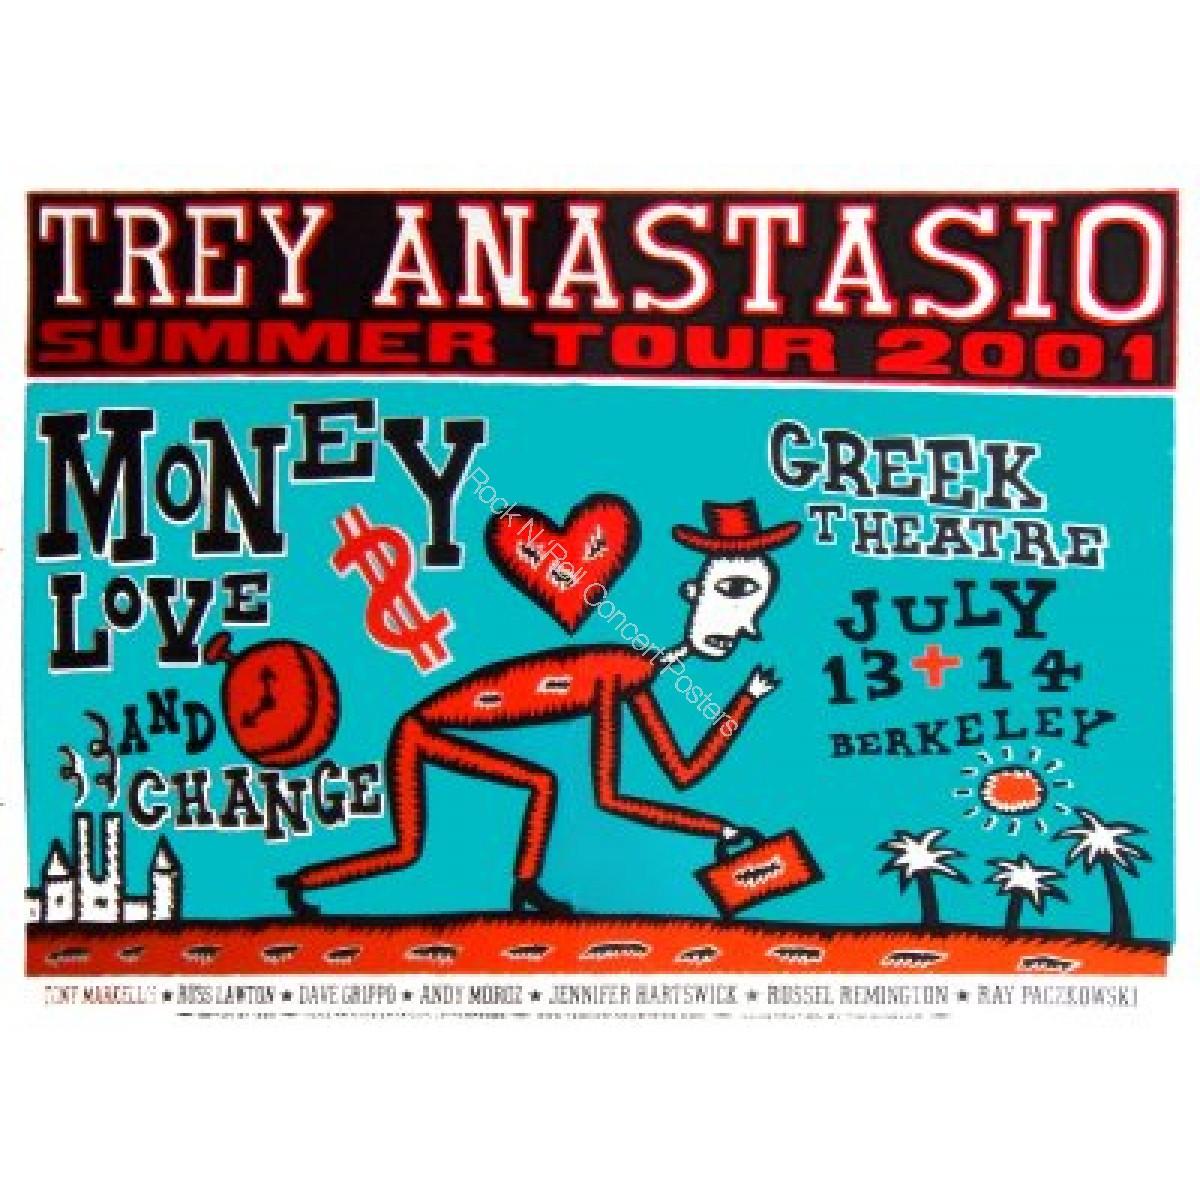 Trey Anastasio @ The Greek Theatre 7/13-14/01 Linocut Silk Screen Print